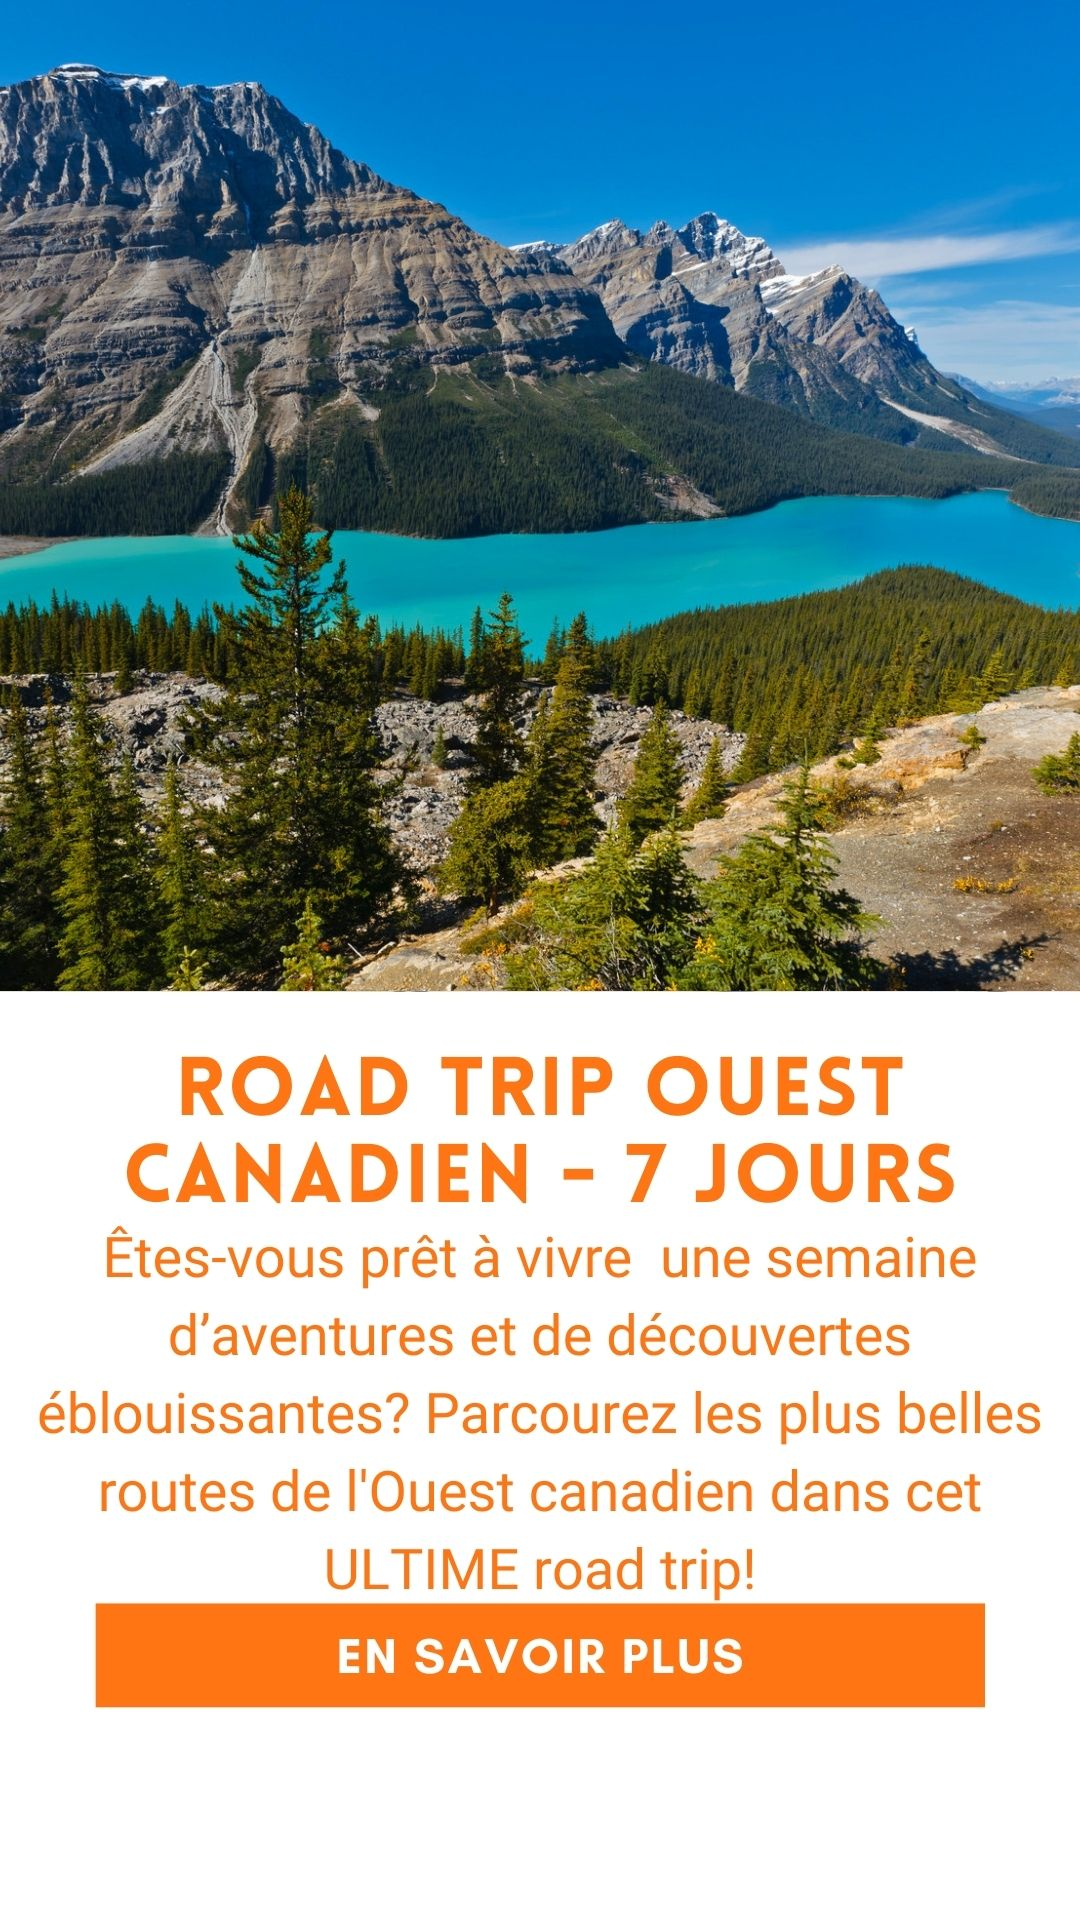 Road trip ouest canadien